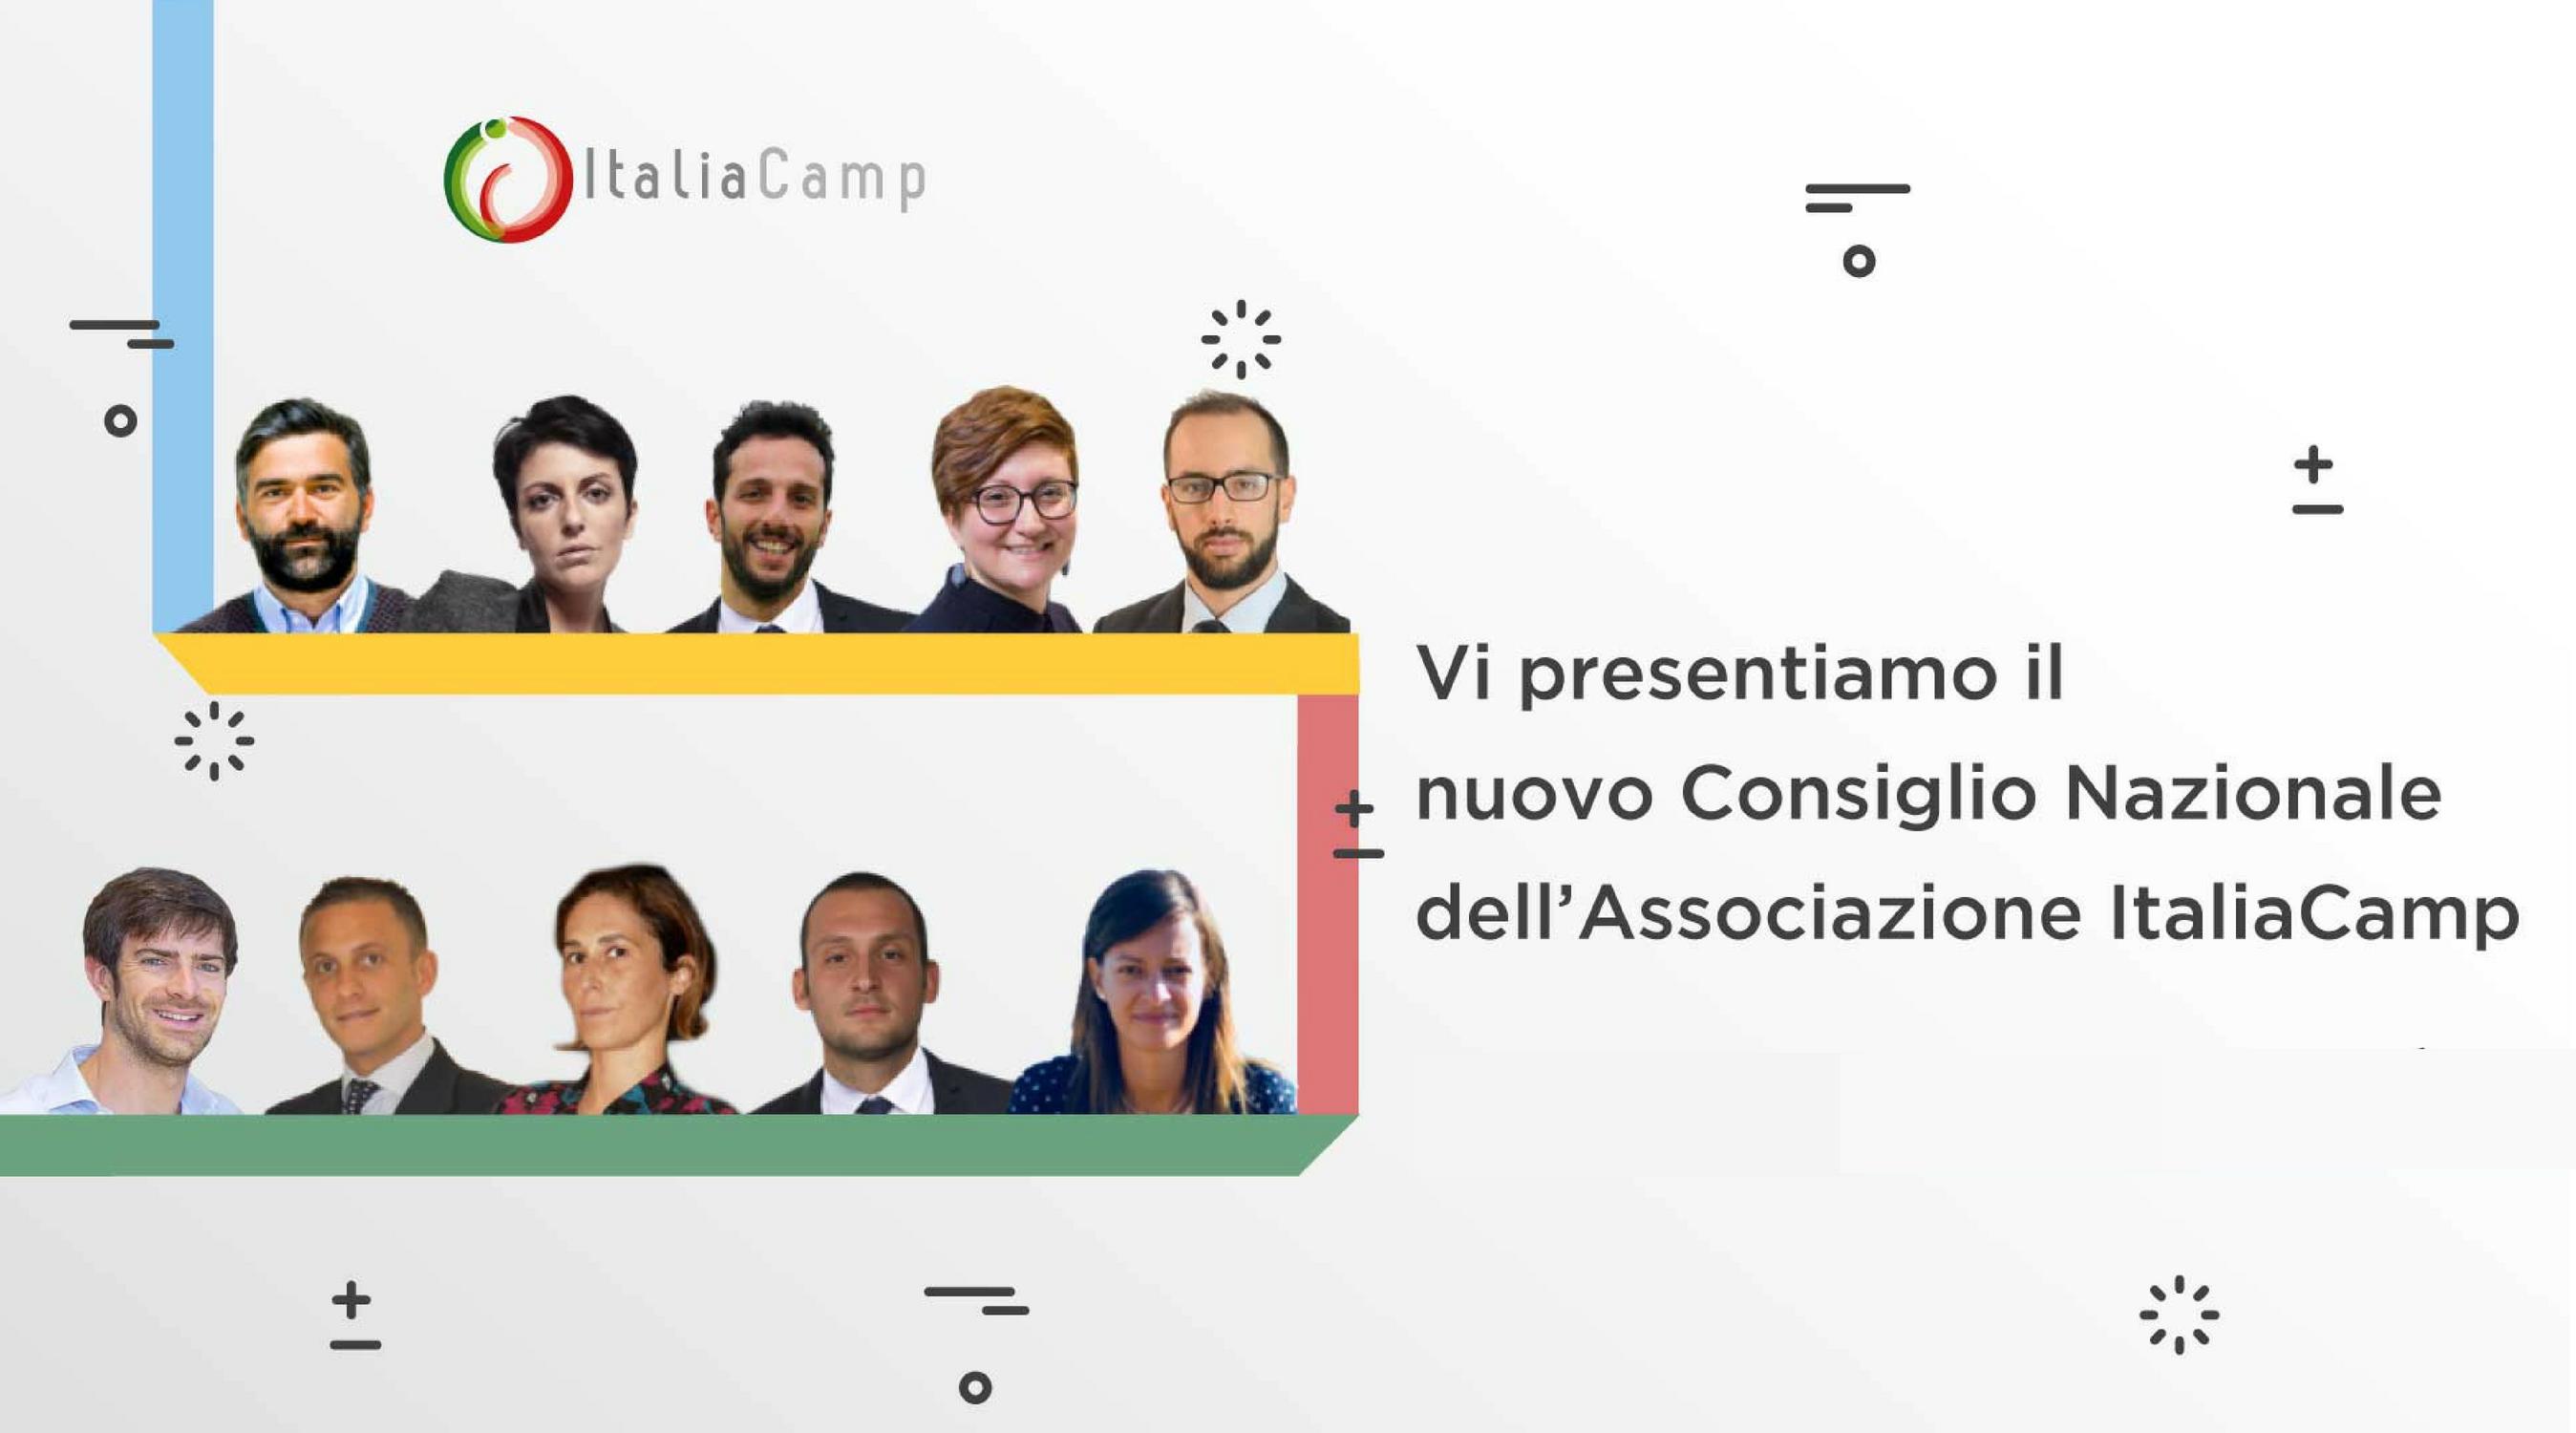 Leo Cisotta Presidente Associazione ItaliaCamp